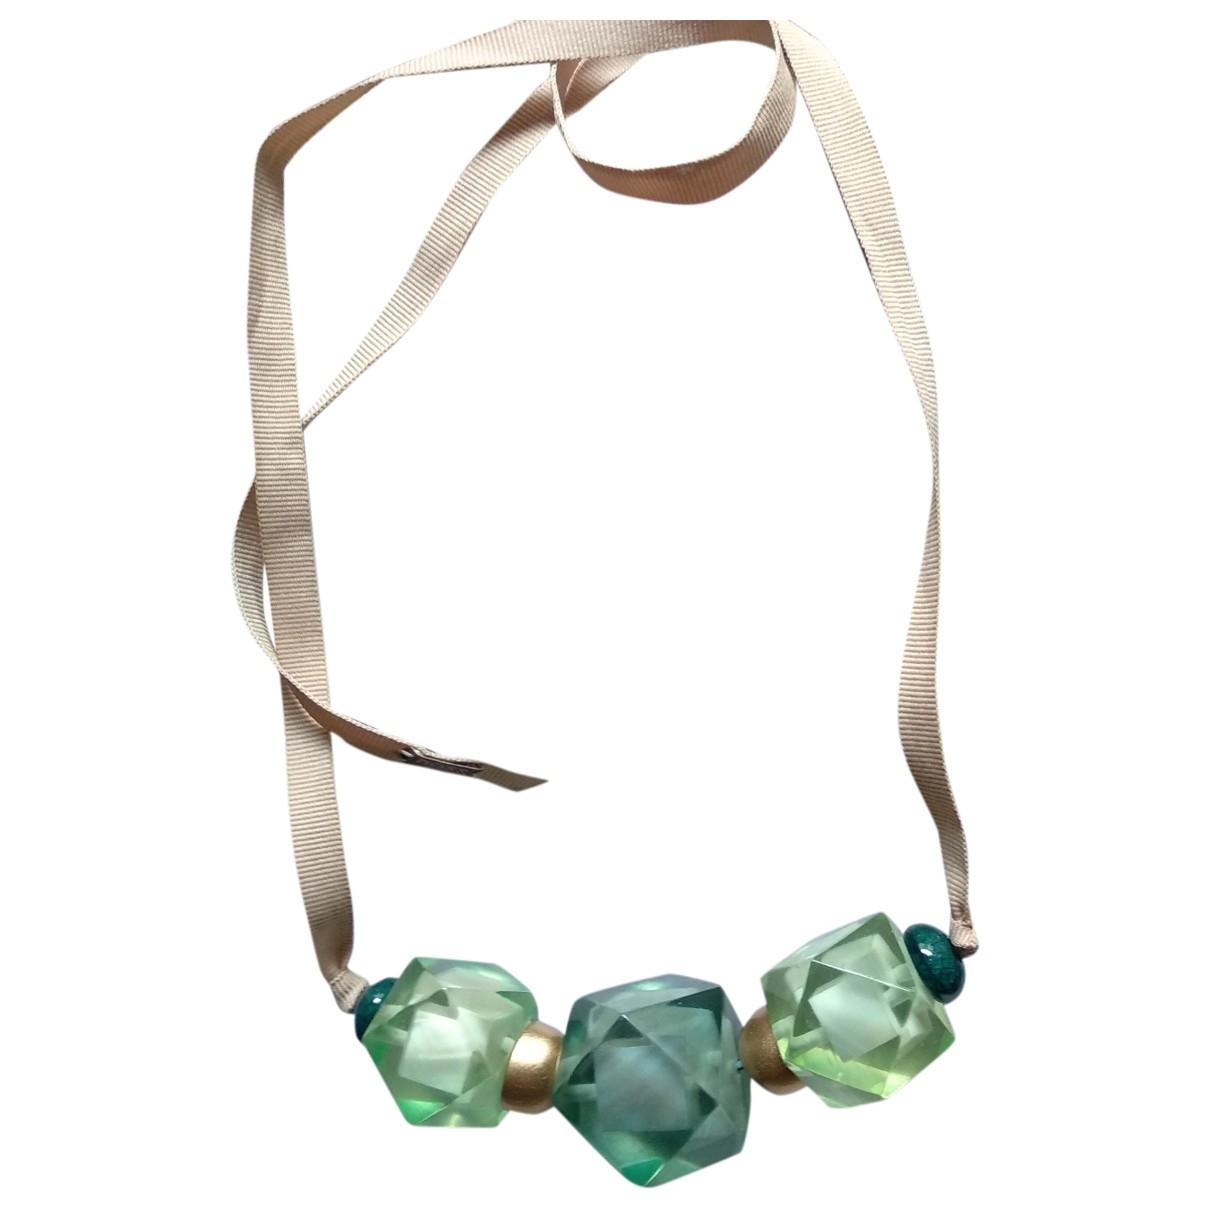 Hoss Intropia \N Green Metal necklace for Women \N